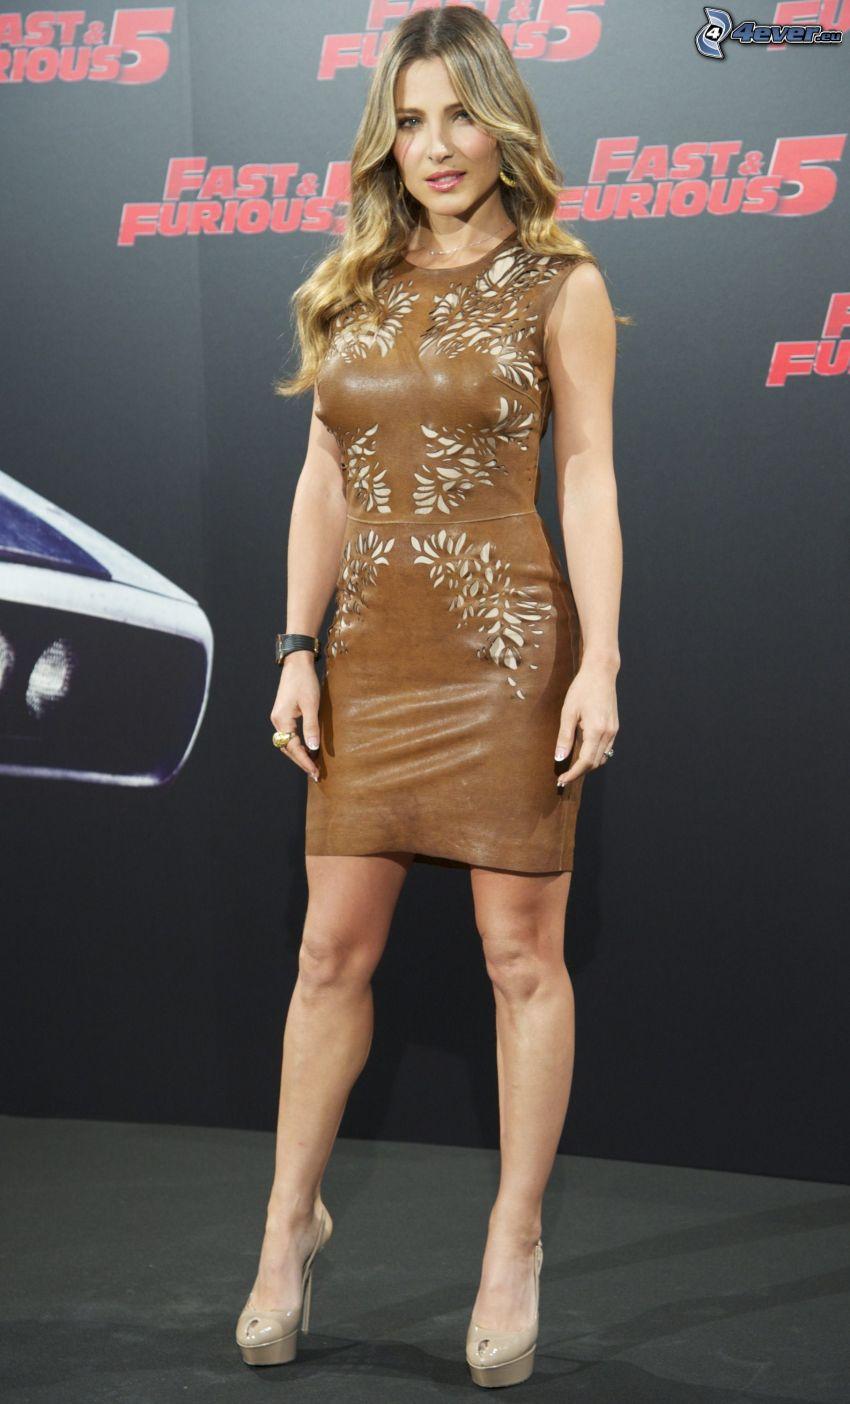 Elsa Pataky, braunen Kleid